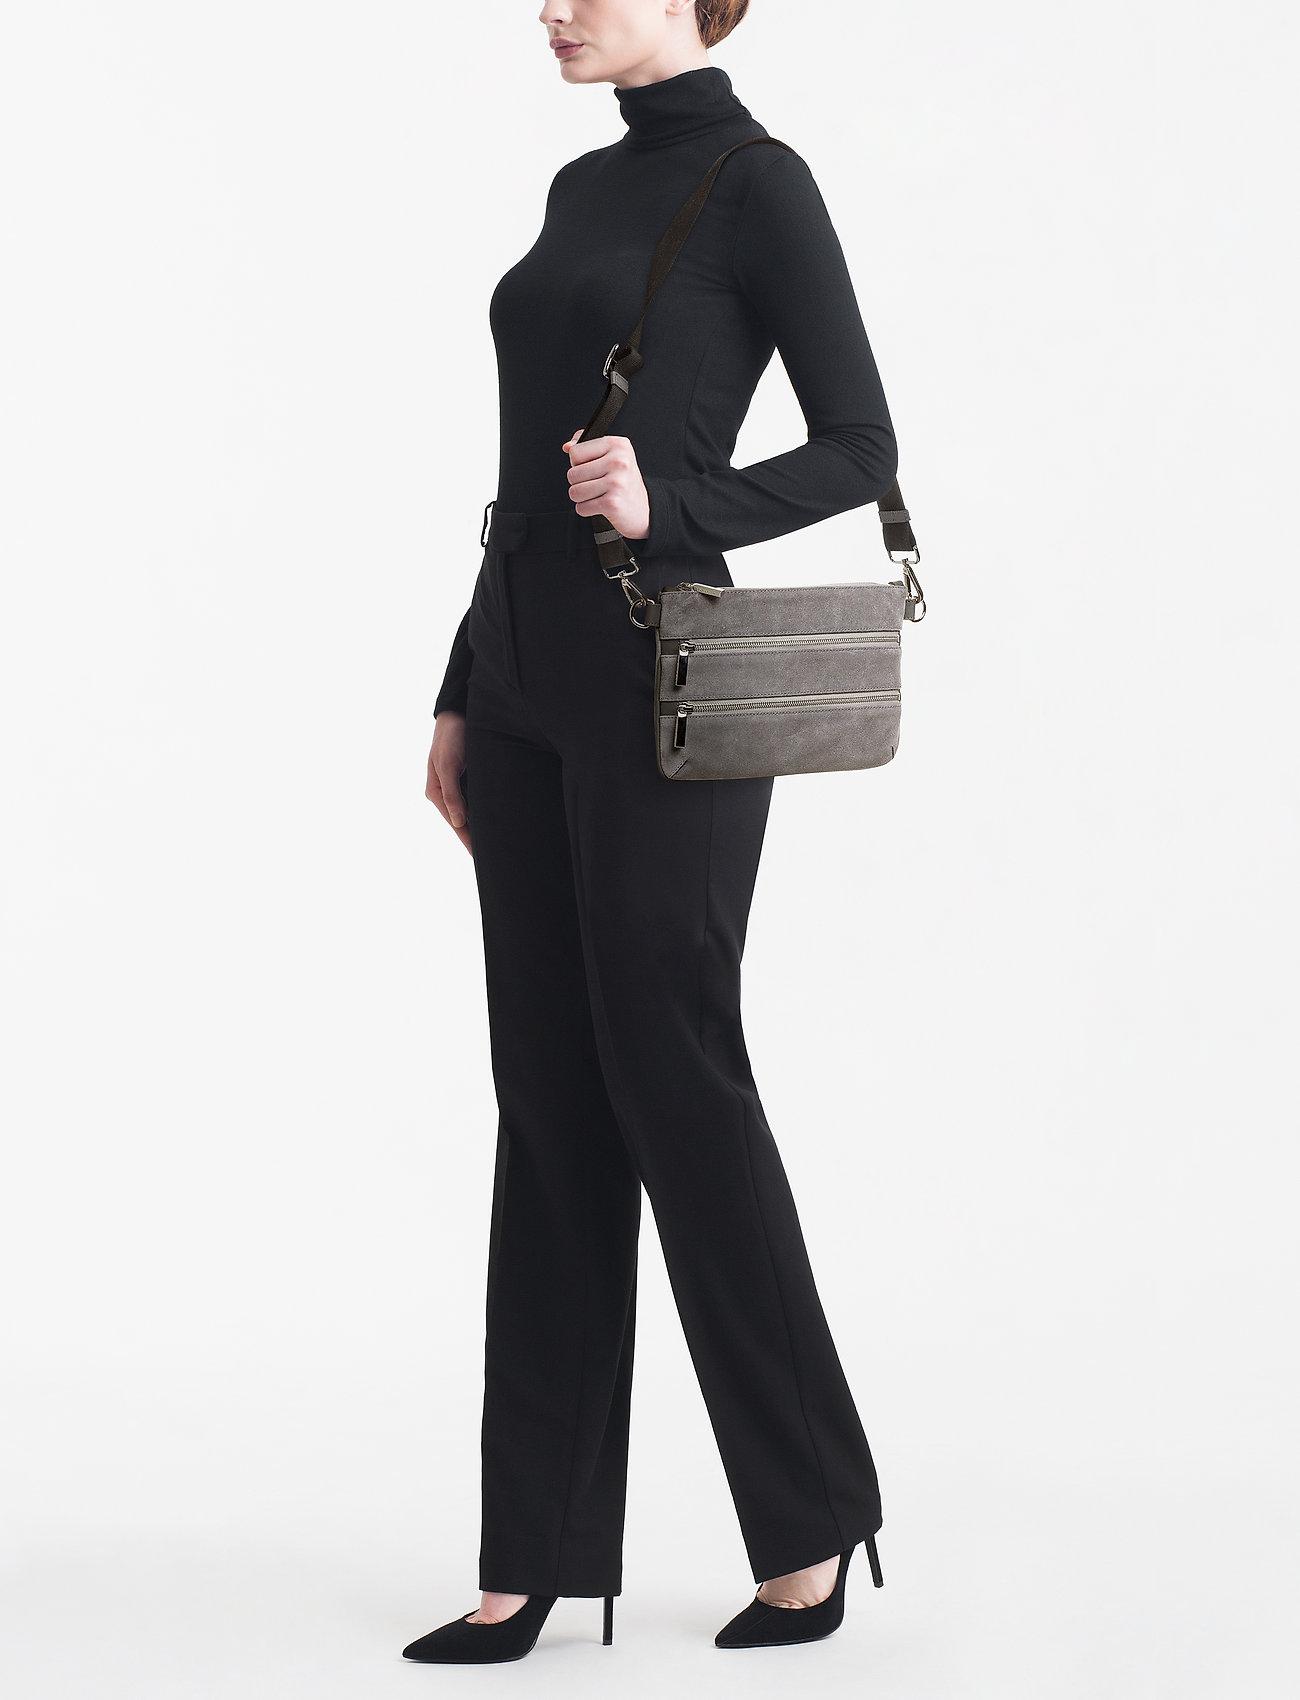 Decadent Belt bag - SUEDE GREY